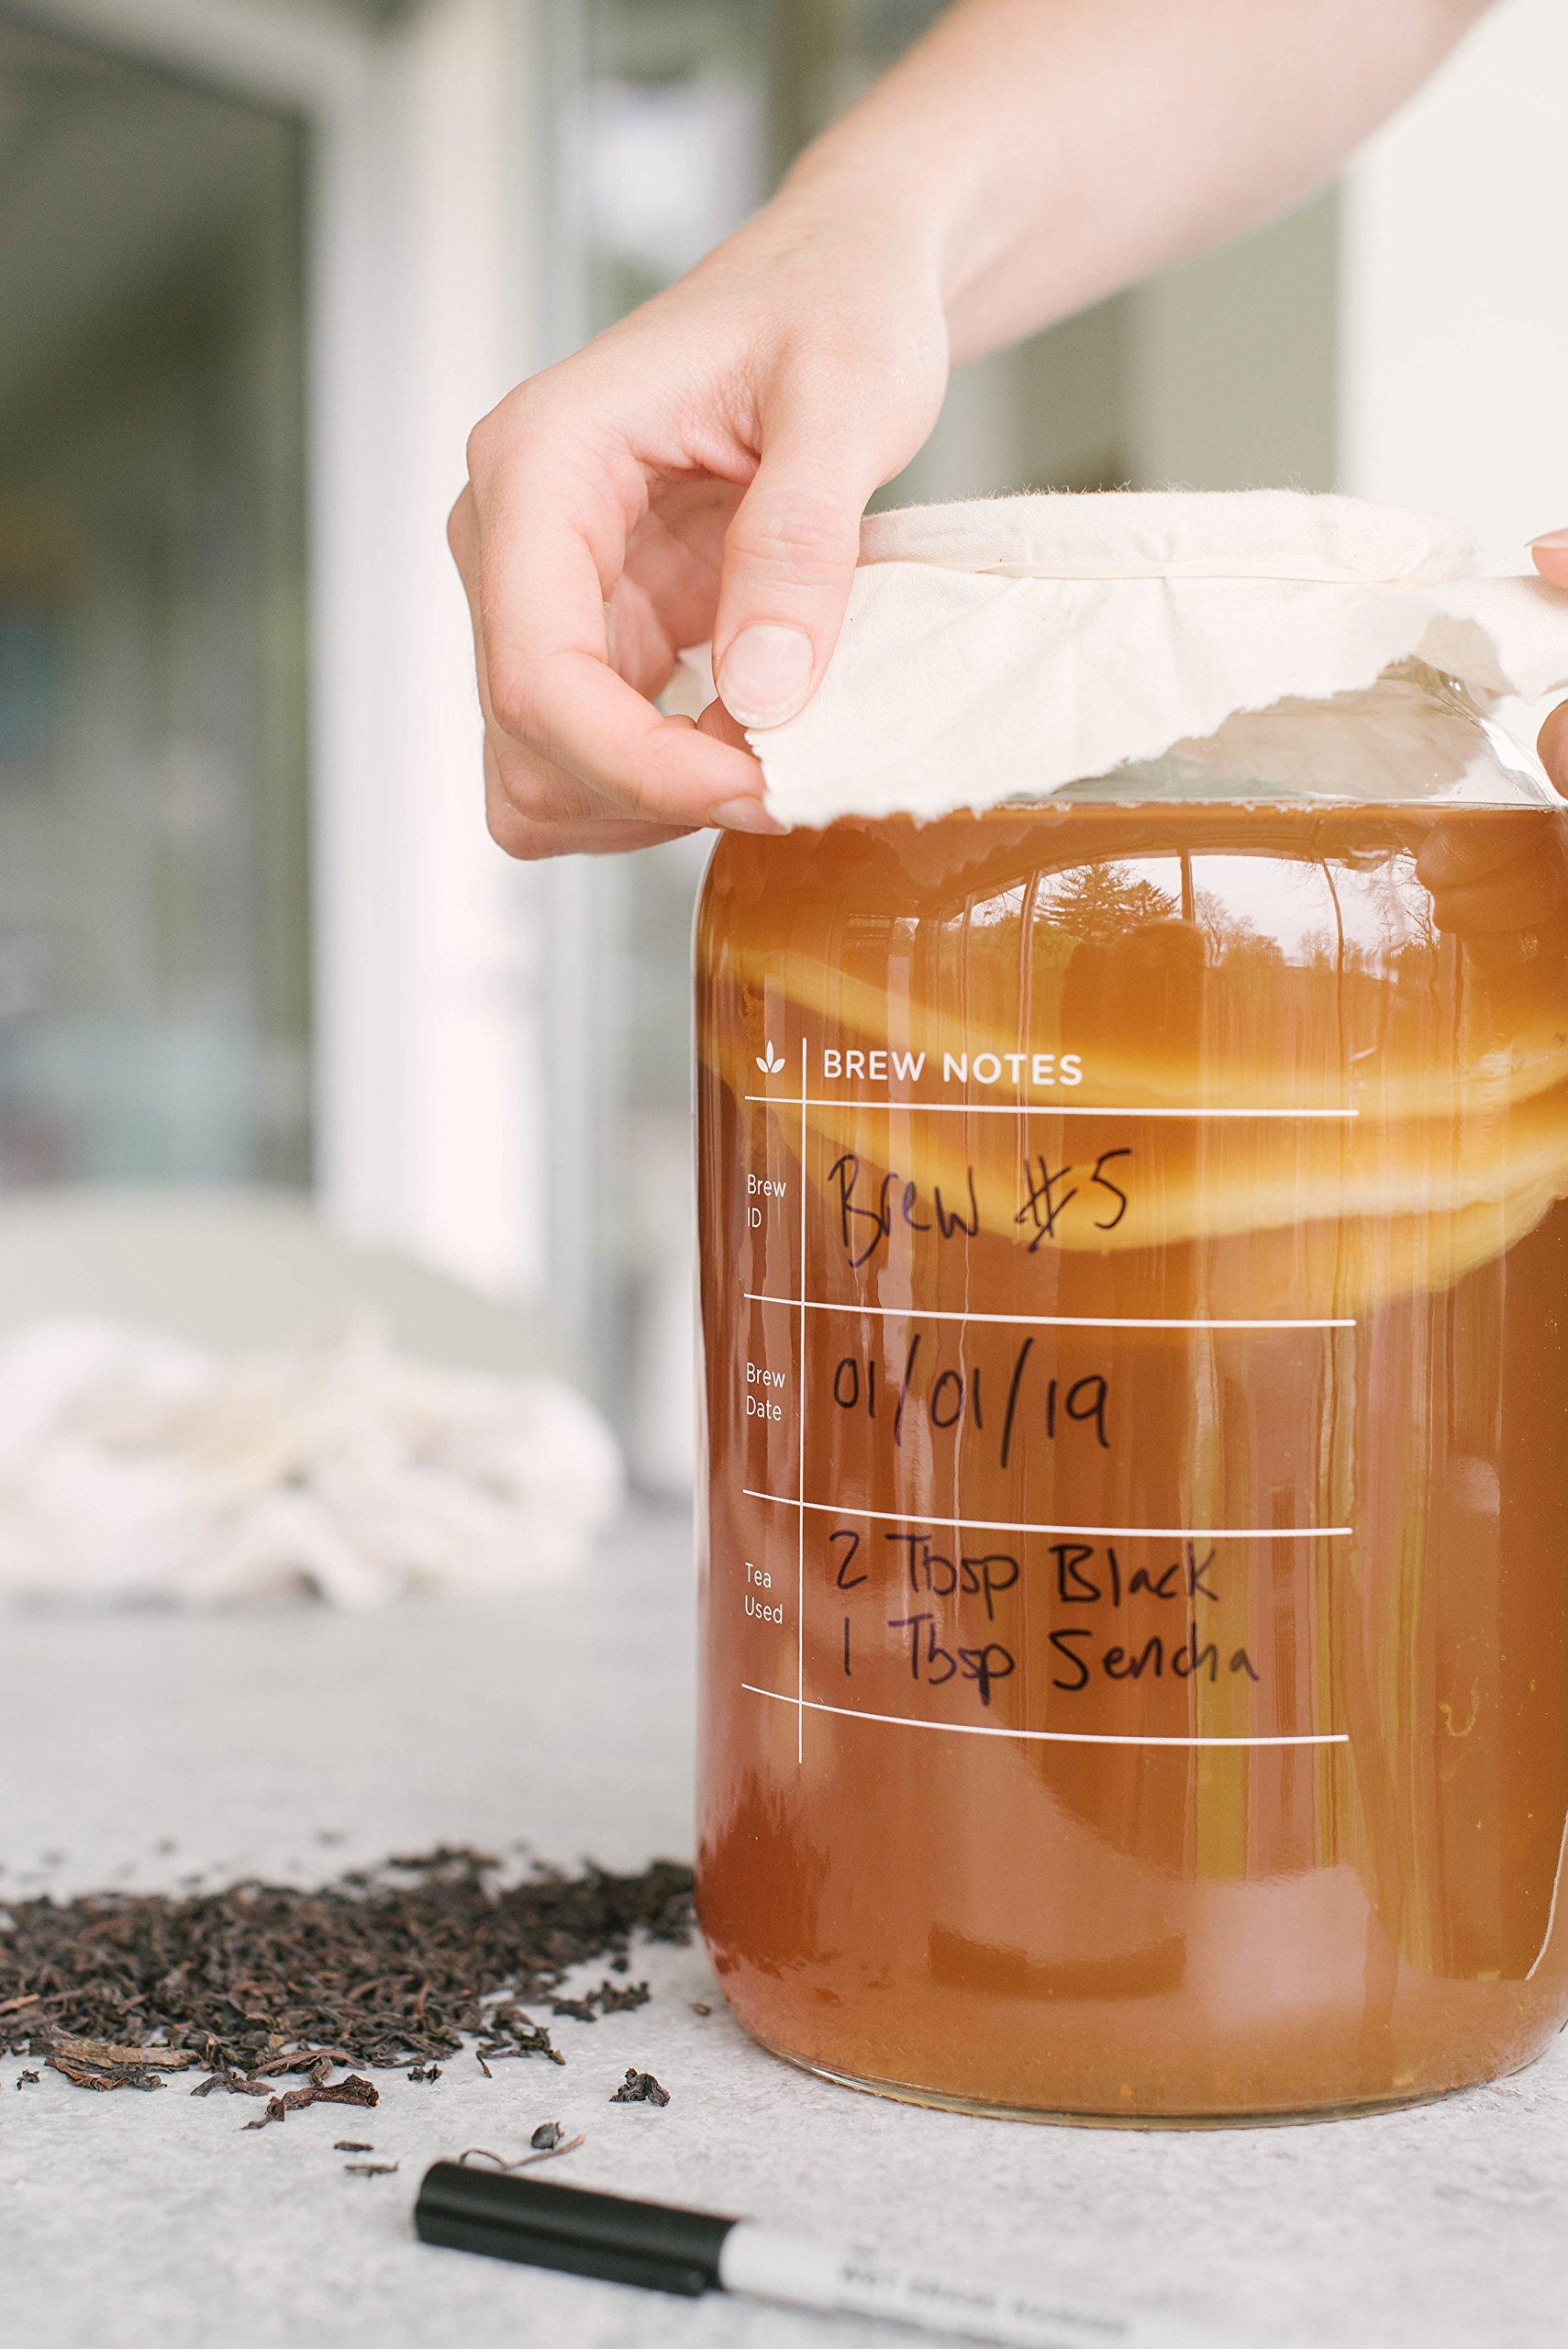 Kombucha Brewing Kit with Organic Kombucha Scoby. Includes Glass Brew Jar, Organic Kombucha Loose Leaf Tea, Temperature Gauge, Organic Sugar and More! by The Kombucha Shop (Image #6)